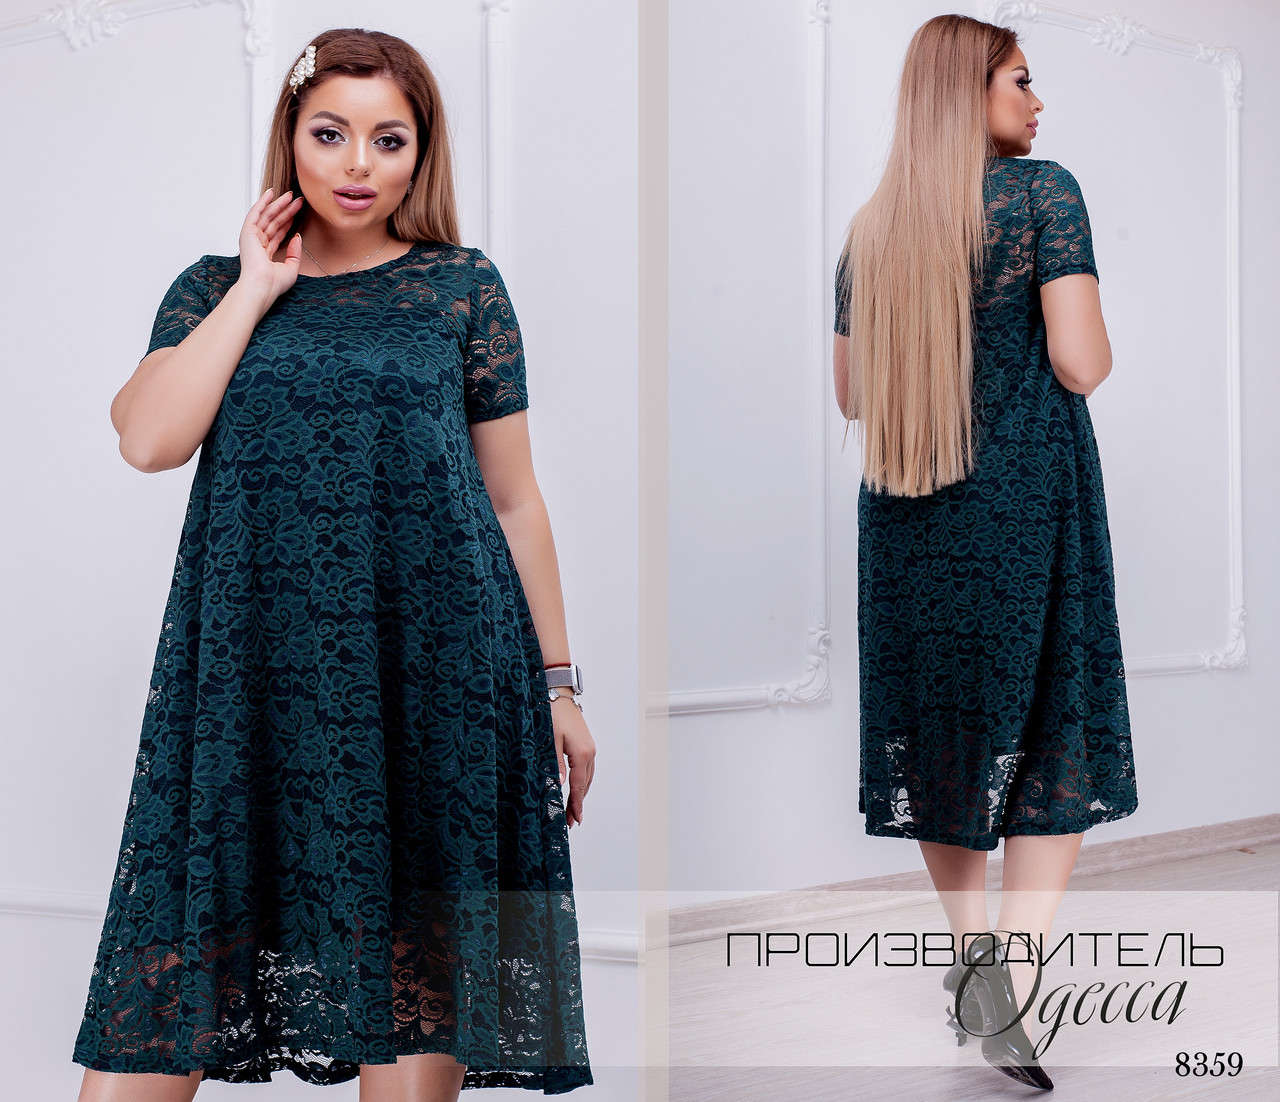 Платье- трапеция короткий рукав гипюр+подклад 50-52,54-56,58-60,62-64